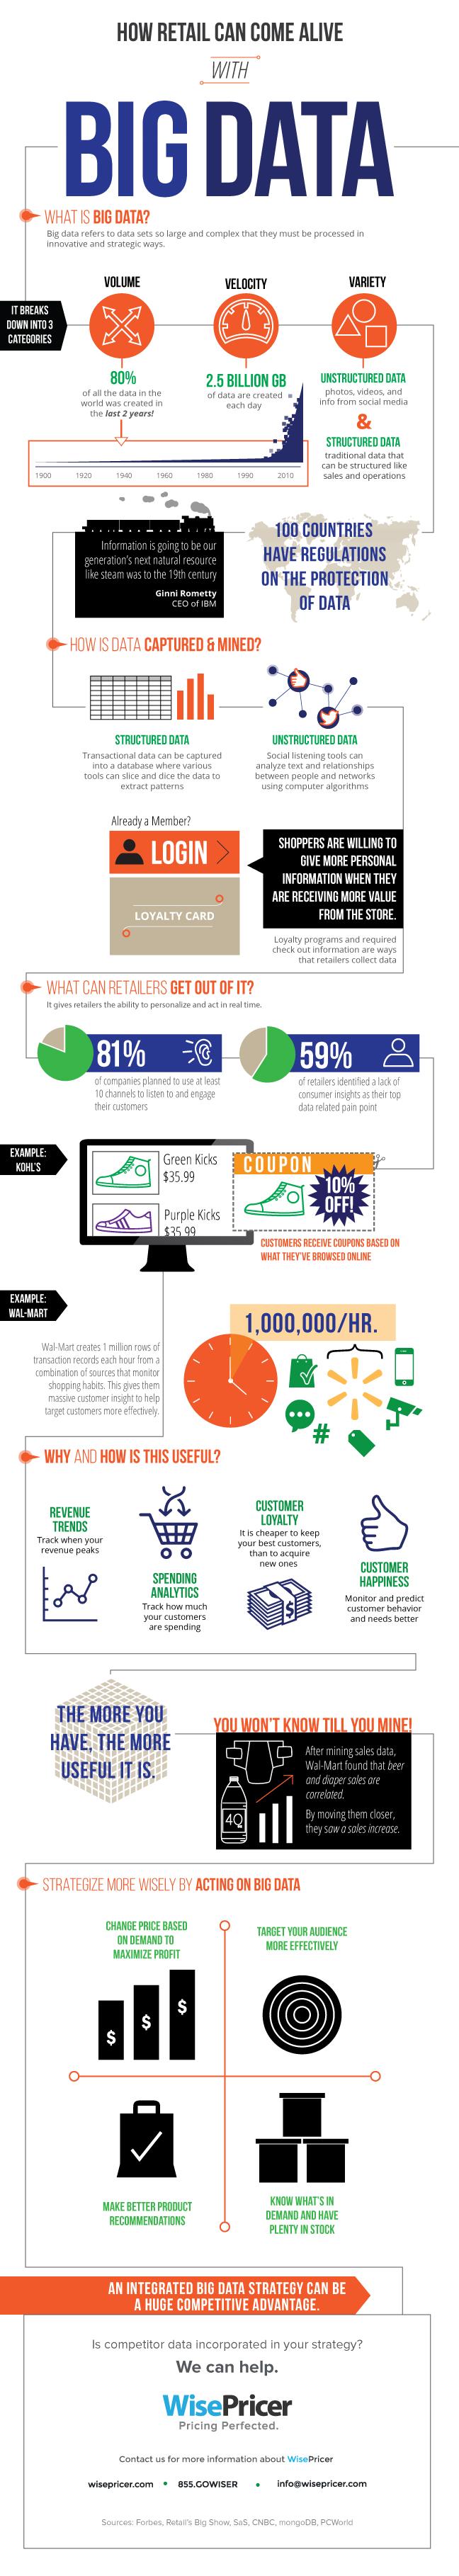 infographic-bigdata-retail